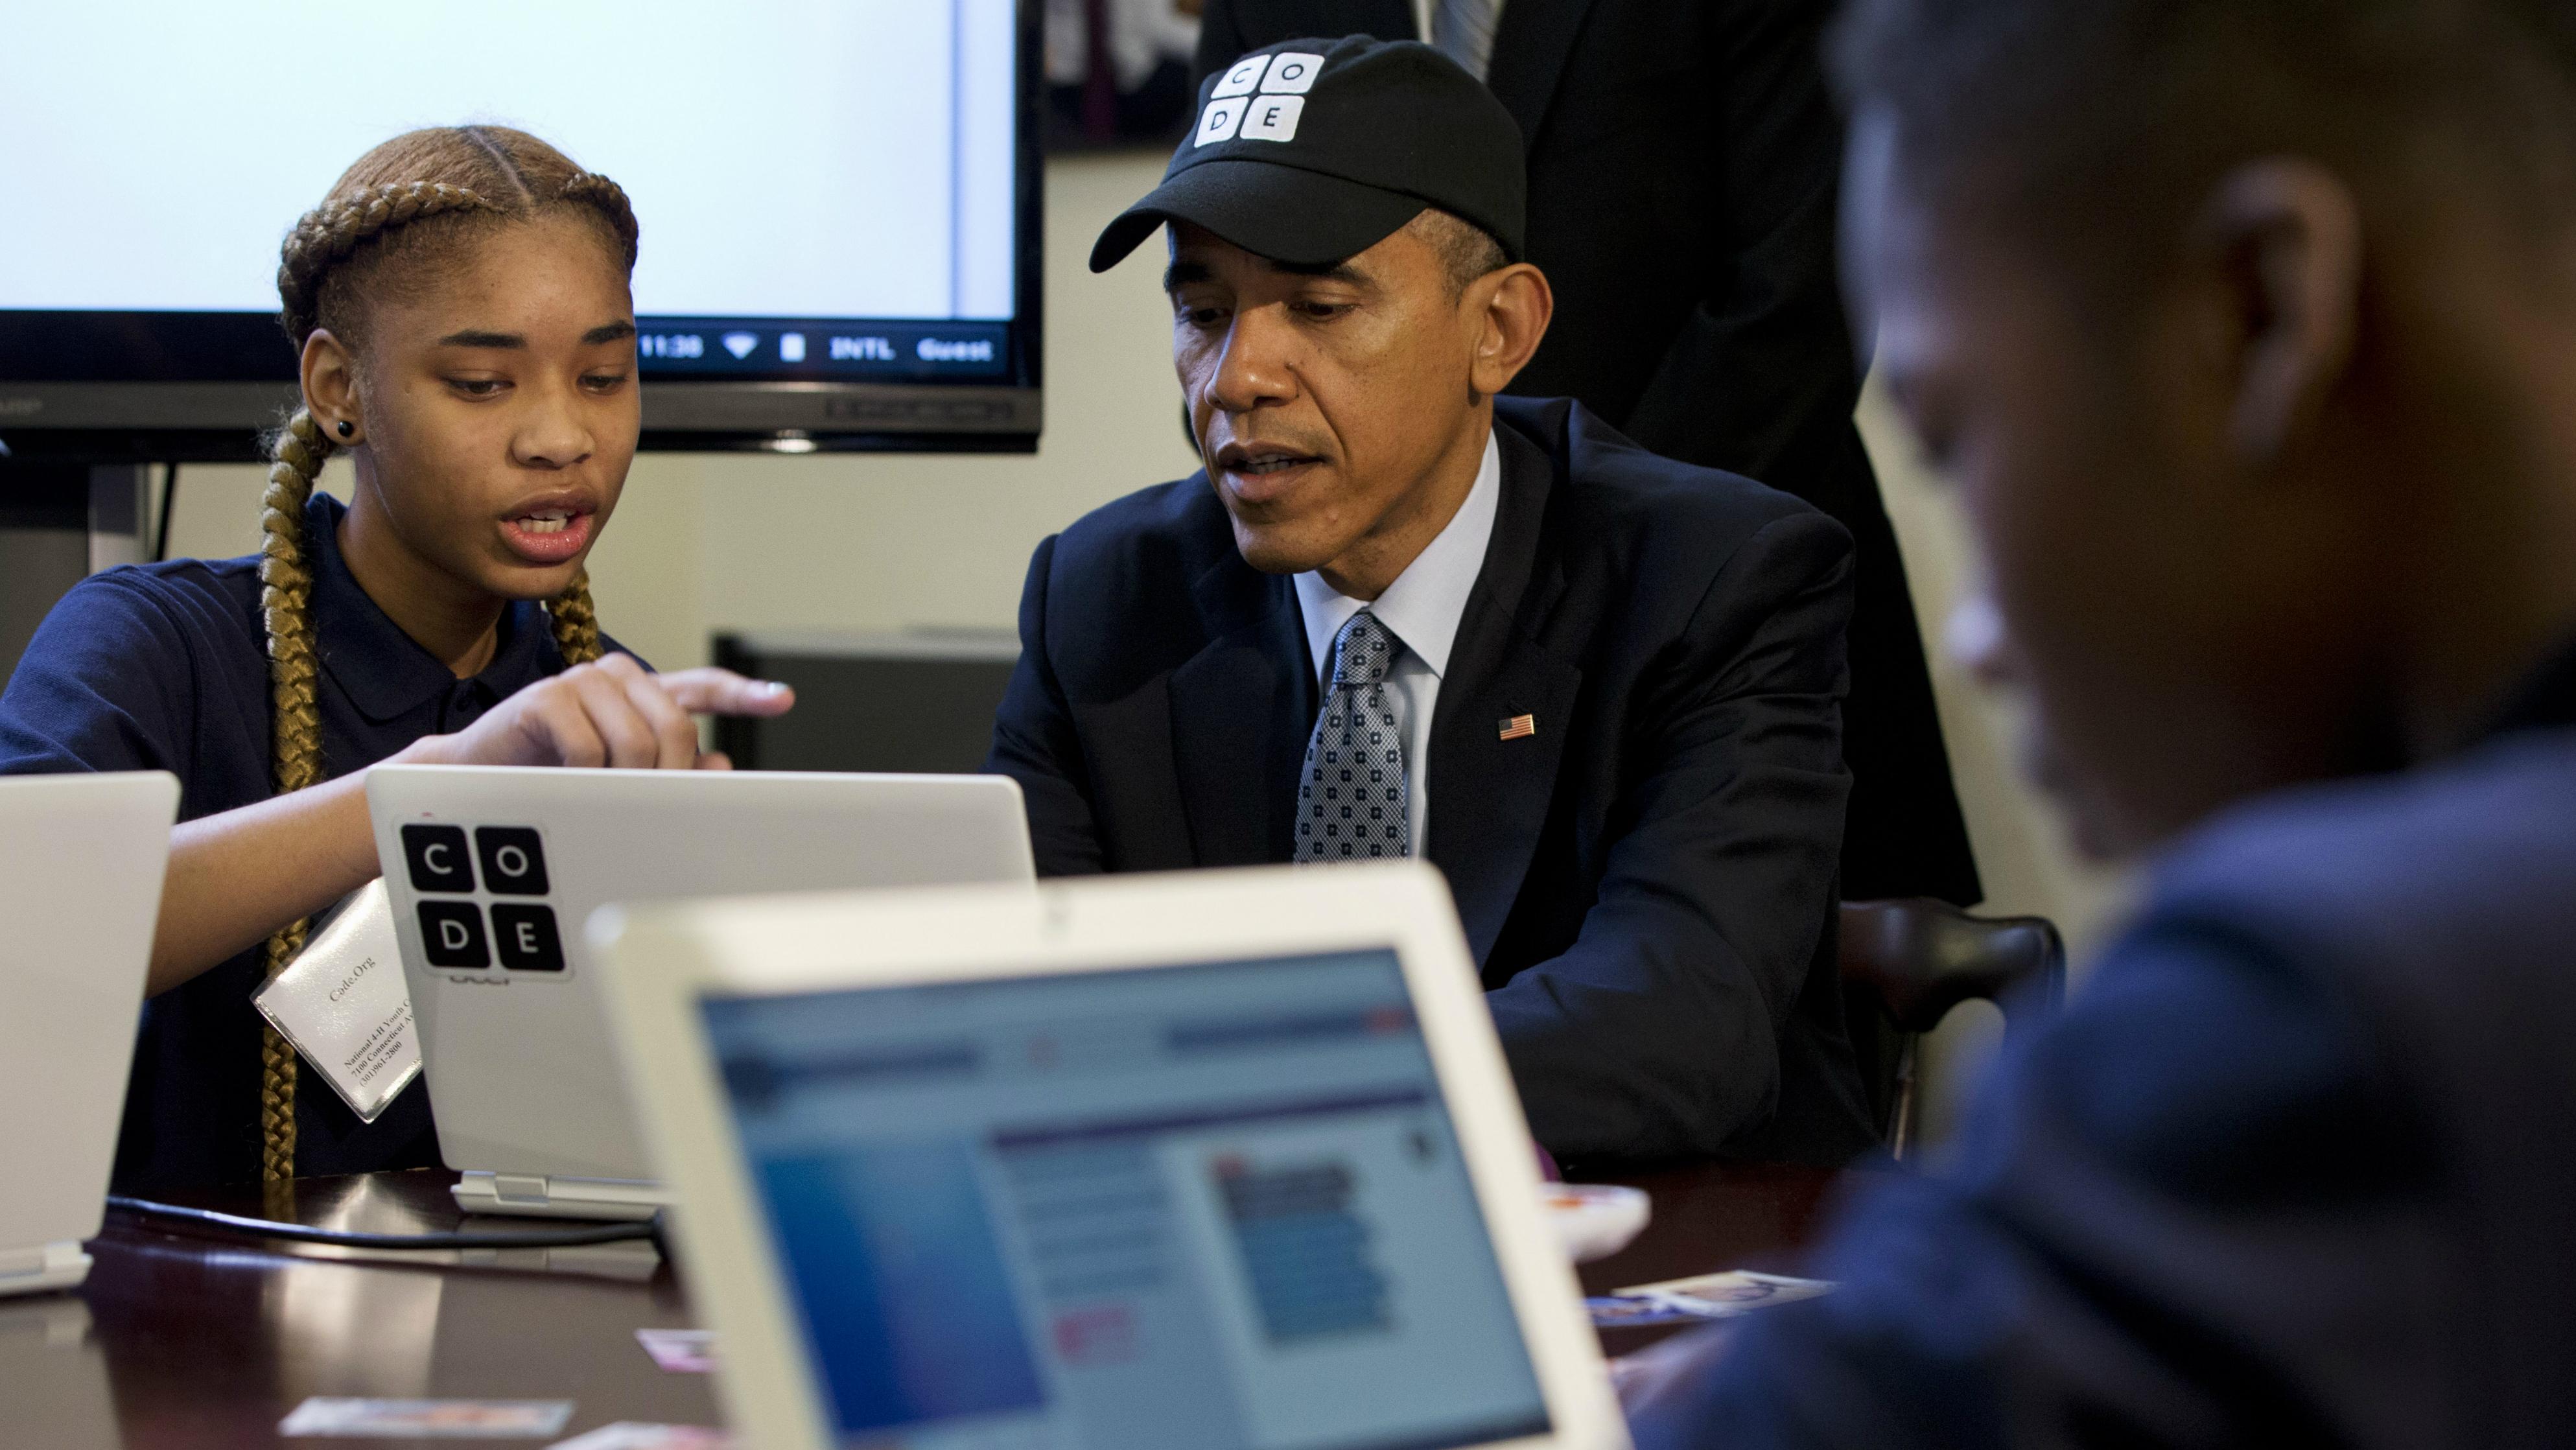 Obama coding